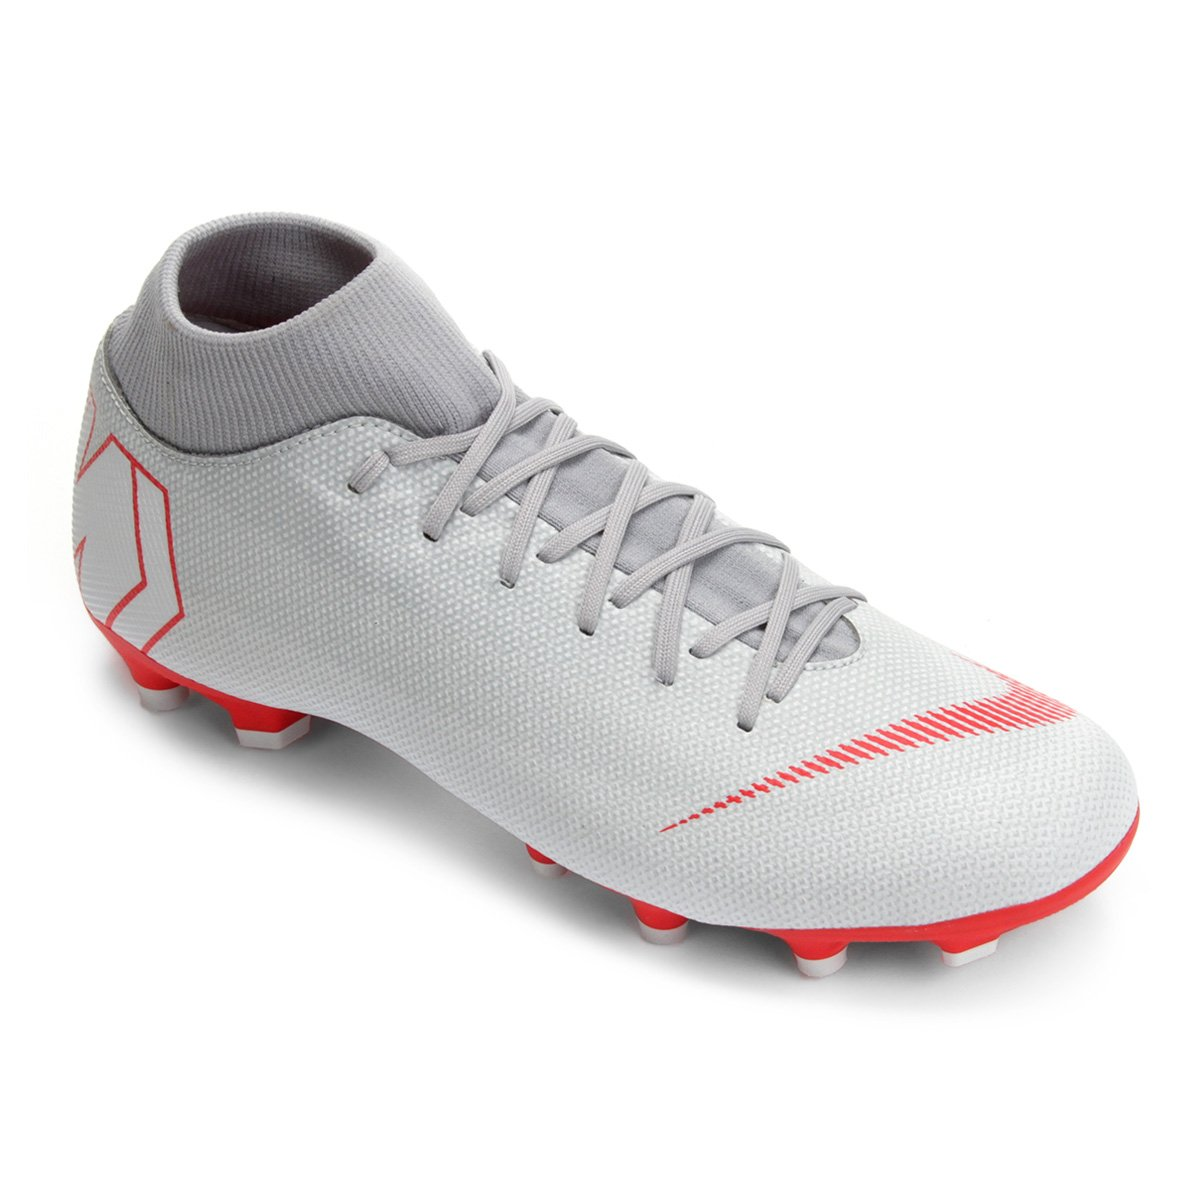 4de46b3b27a8d Chuteira Campo Nike Mercurial Superfly 6 Academy - Cinza - Compre Agora